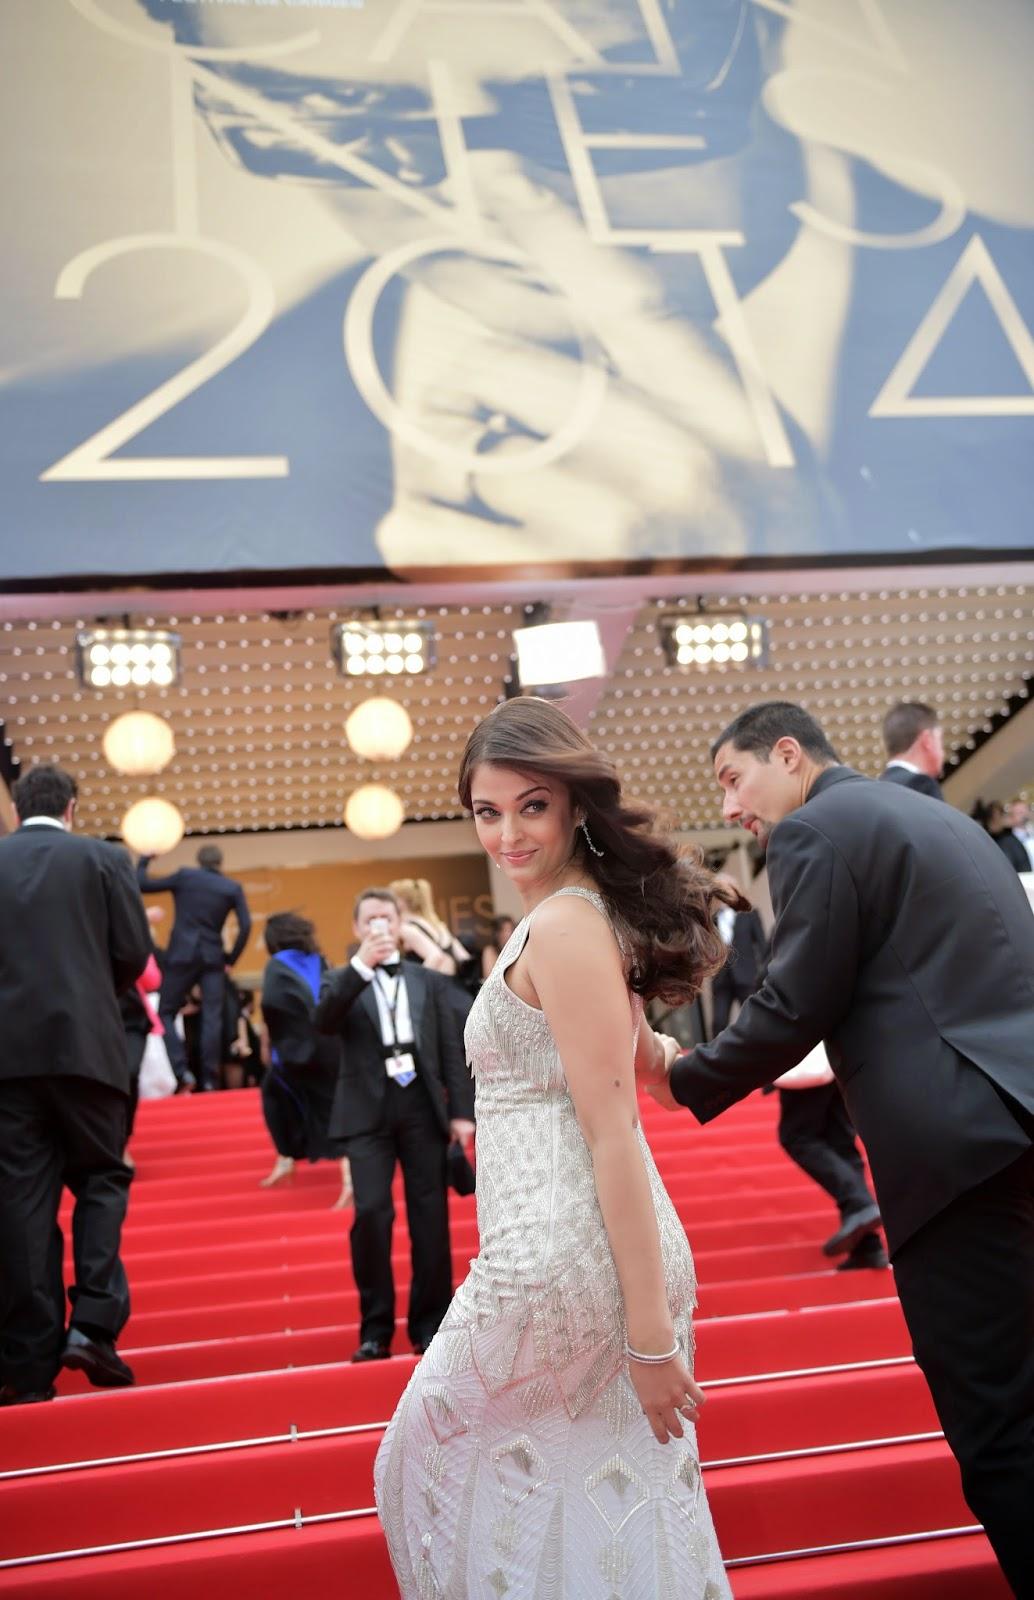 Cannes Film Festival 2014 - Aishwarya Rai Bachchan HD Images & Wallpapers